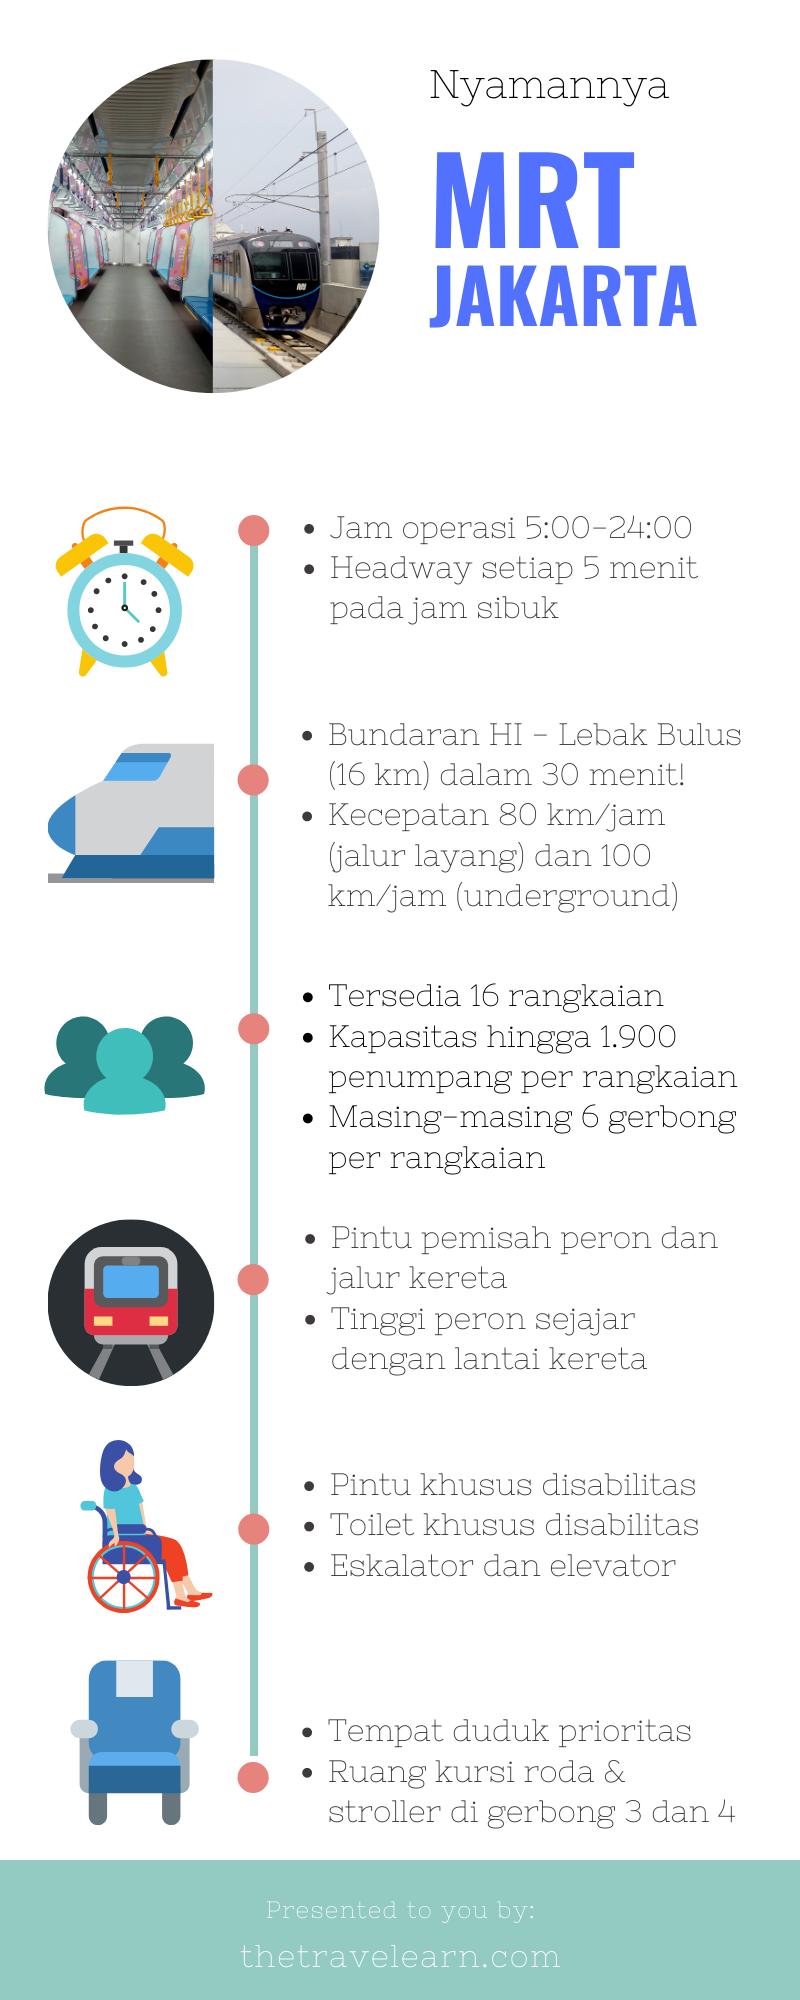 Nyamannya MRT Jakarta